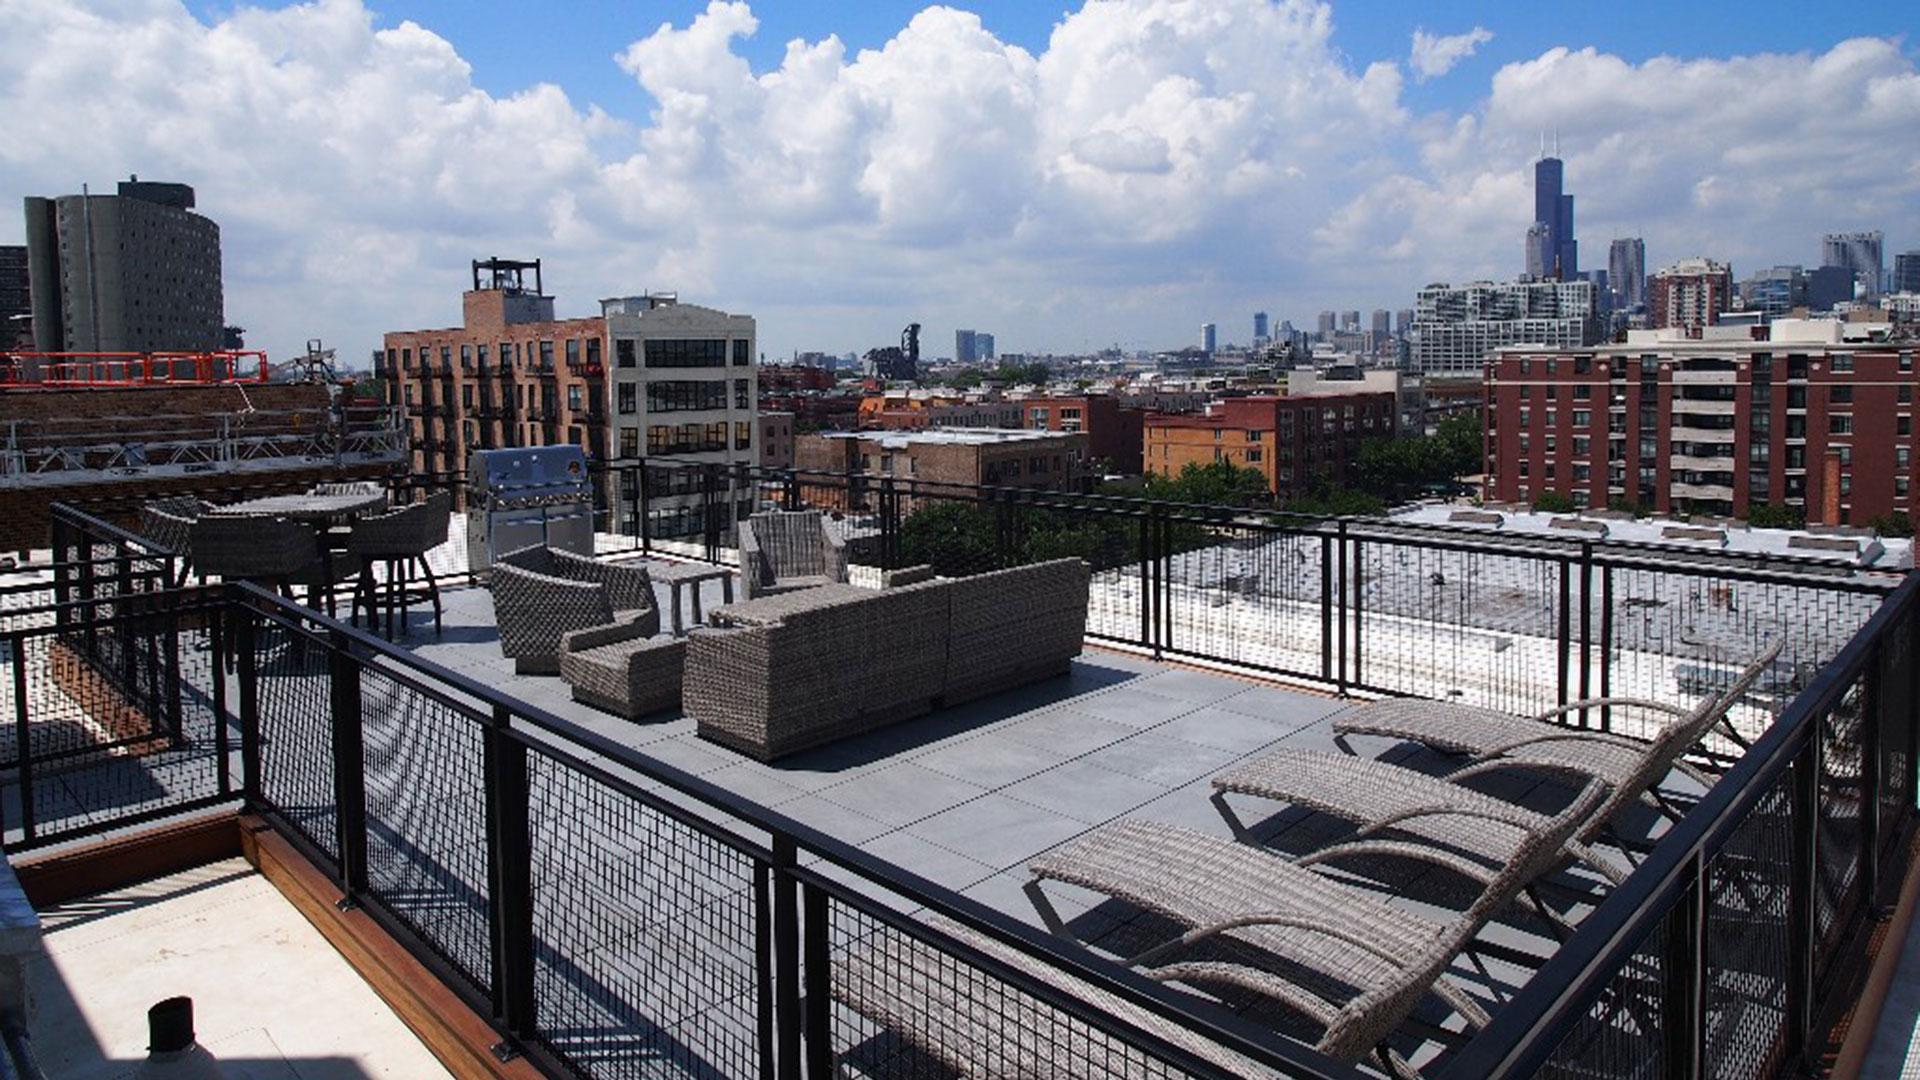 3LRE – 21st Street Lofts